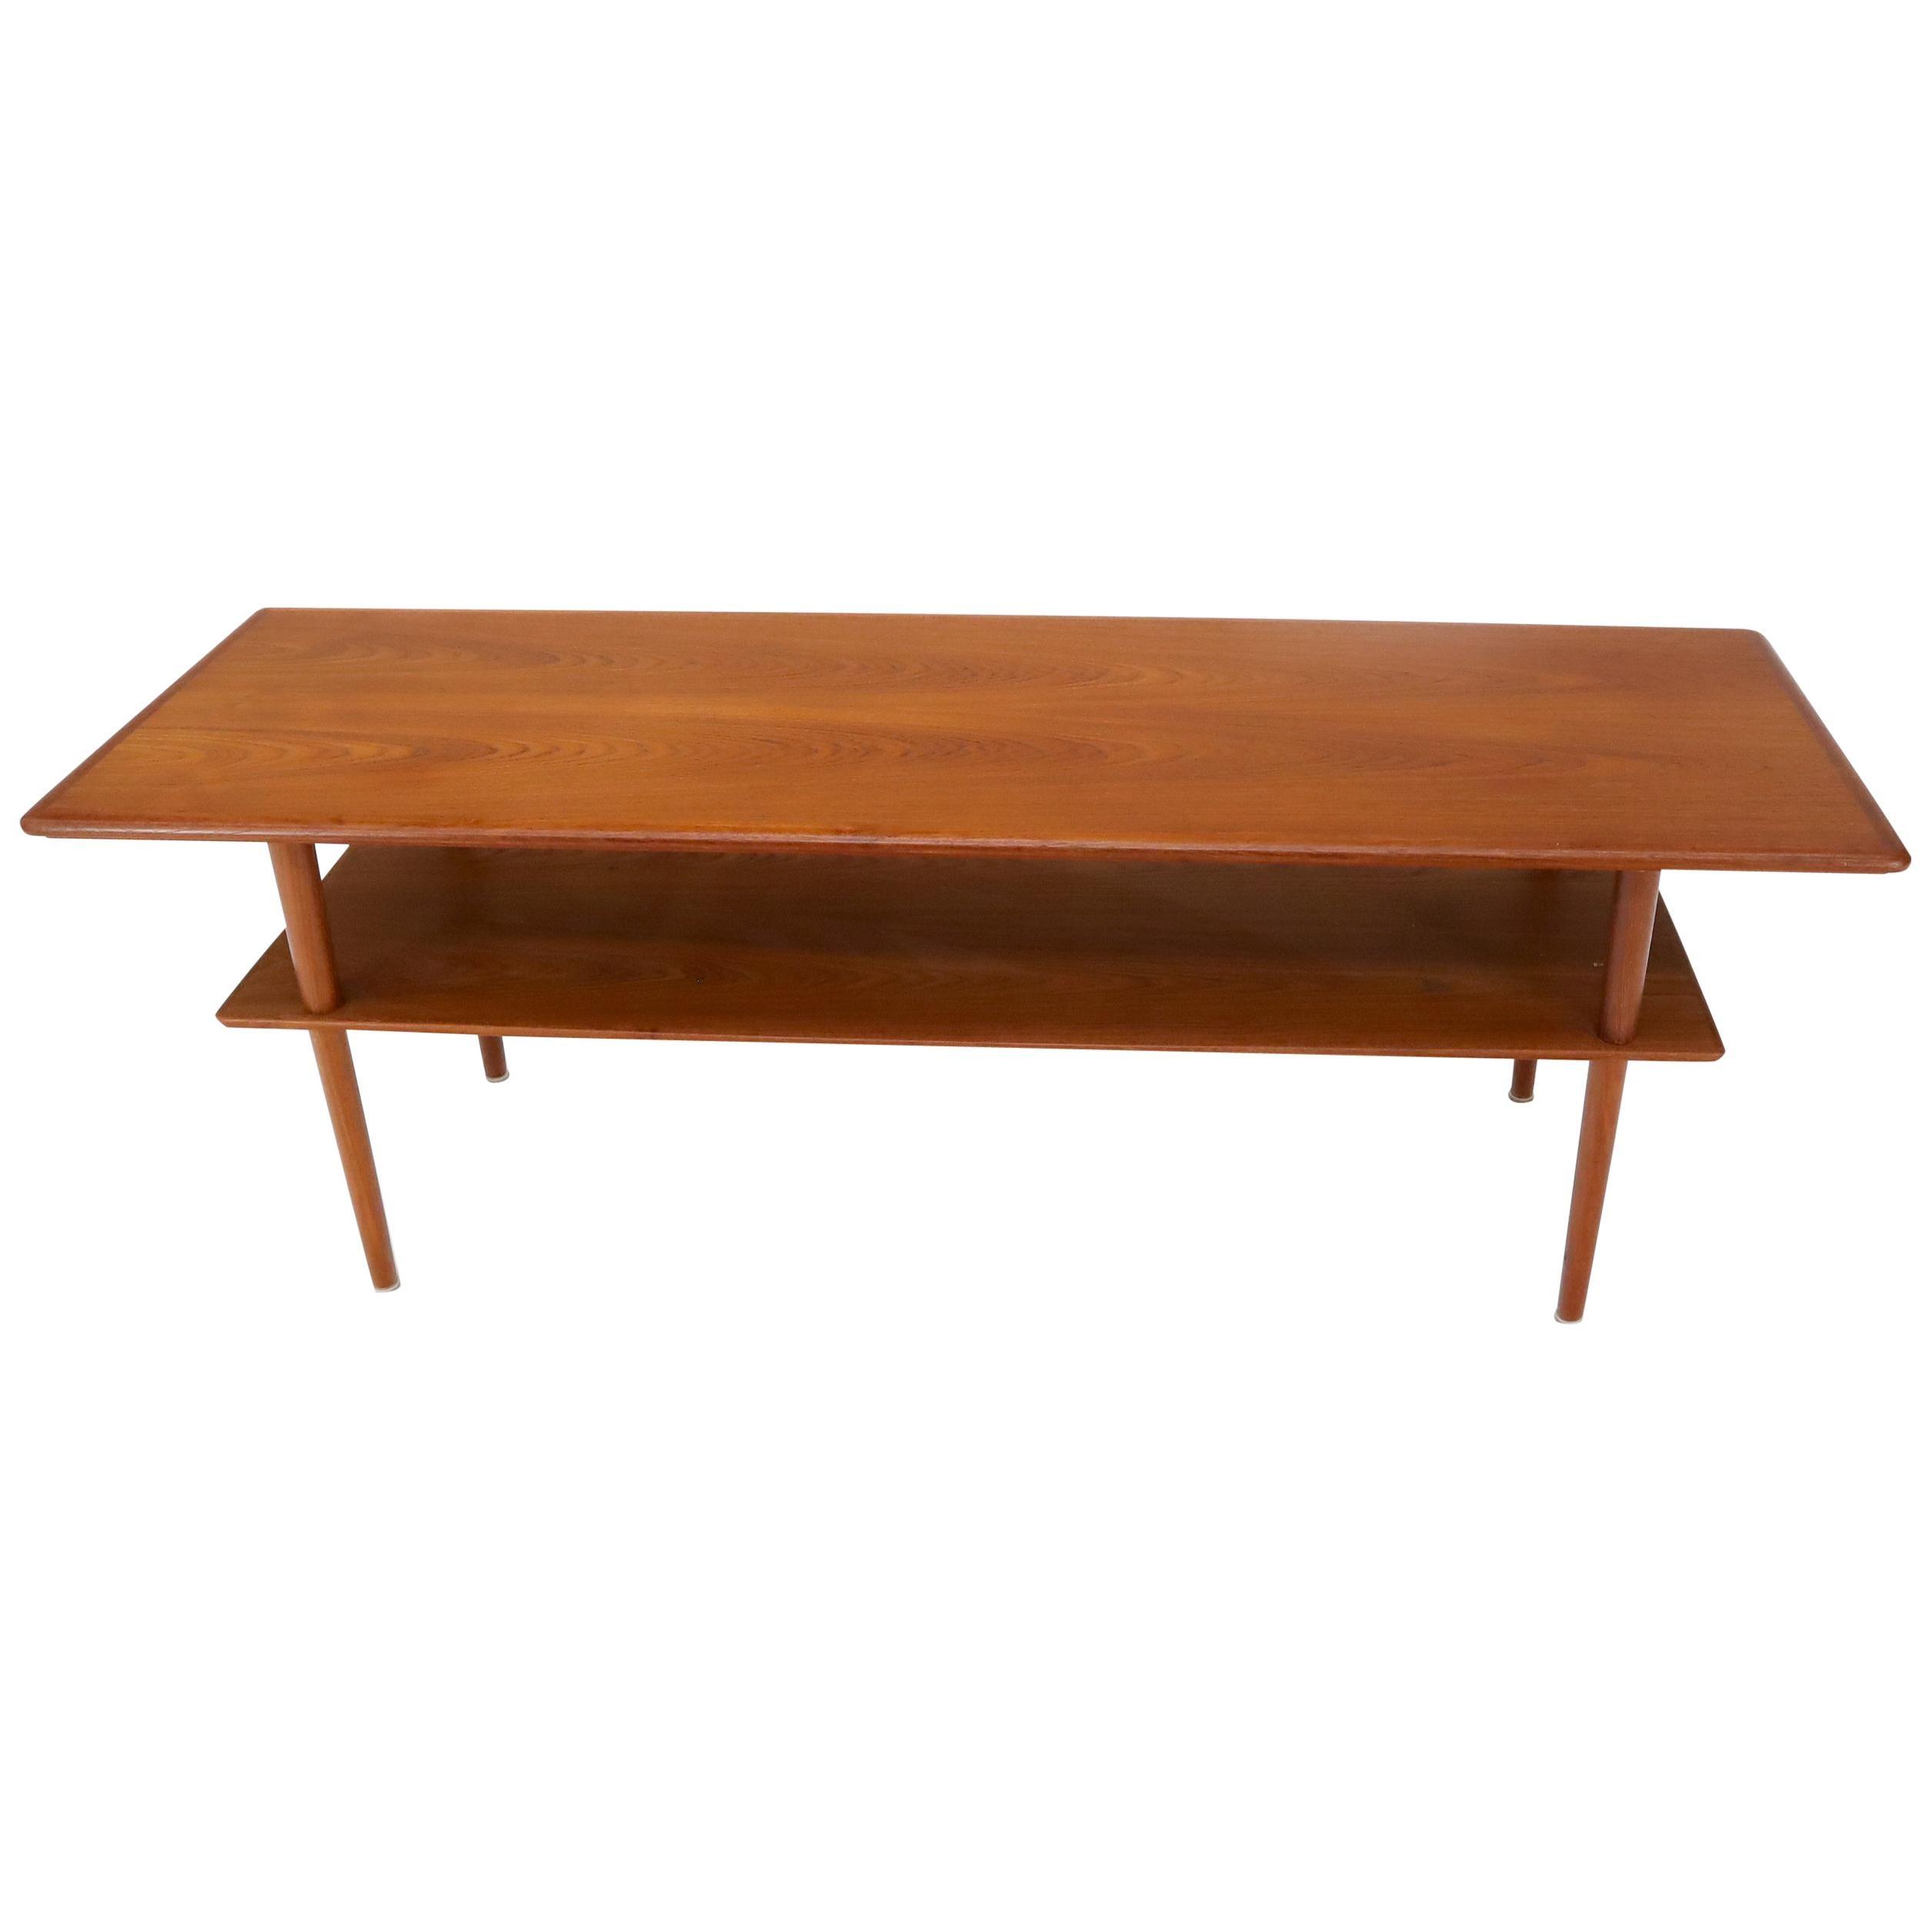 Danish Teak Mid-Century Modern Rectangular One Shelf Coffee Table